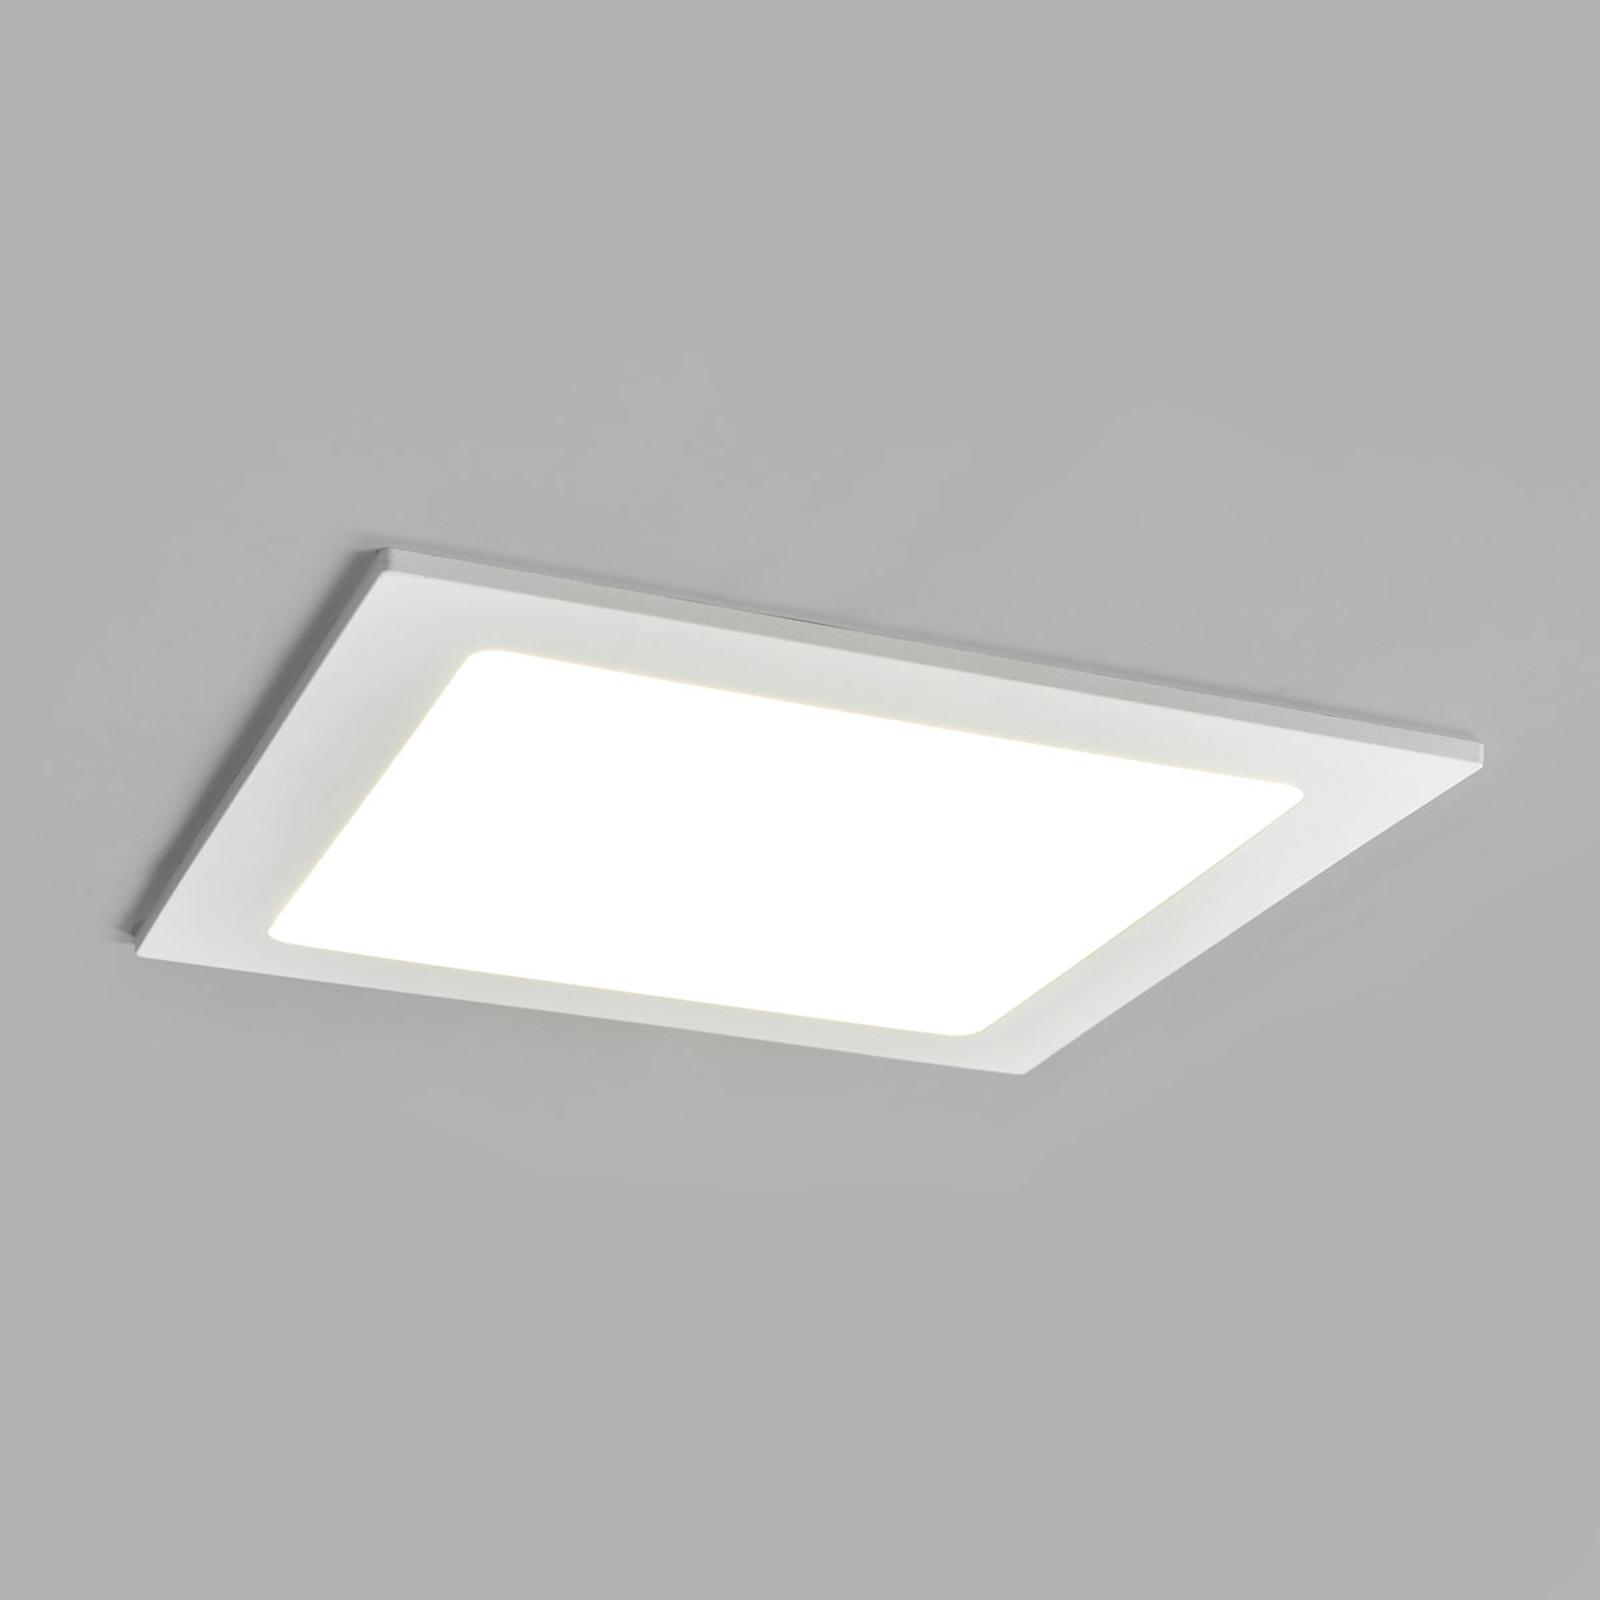 Joki LED downlight white 4000K angular 22cm_9978062_1